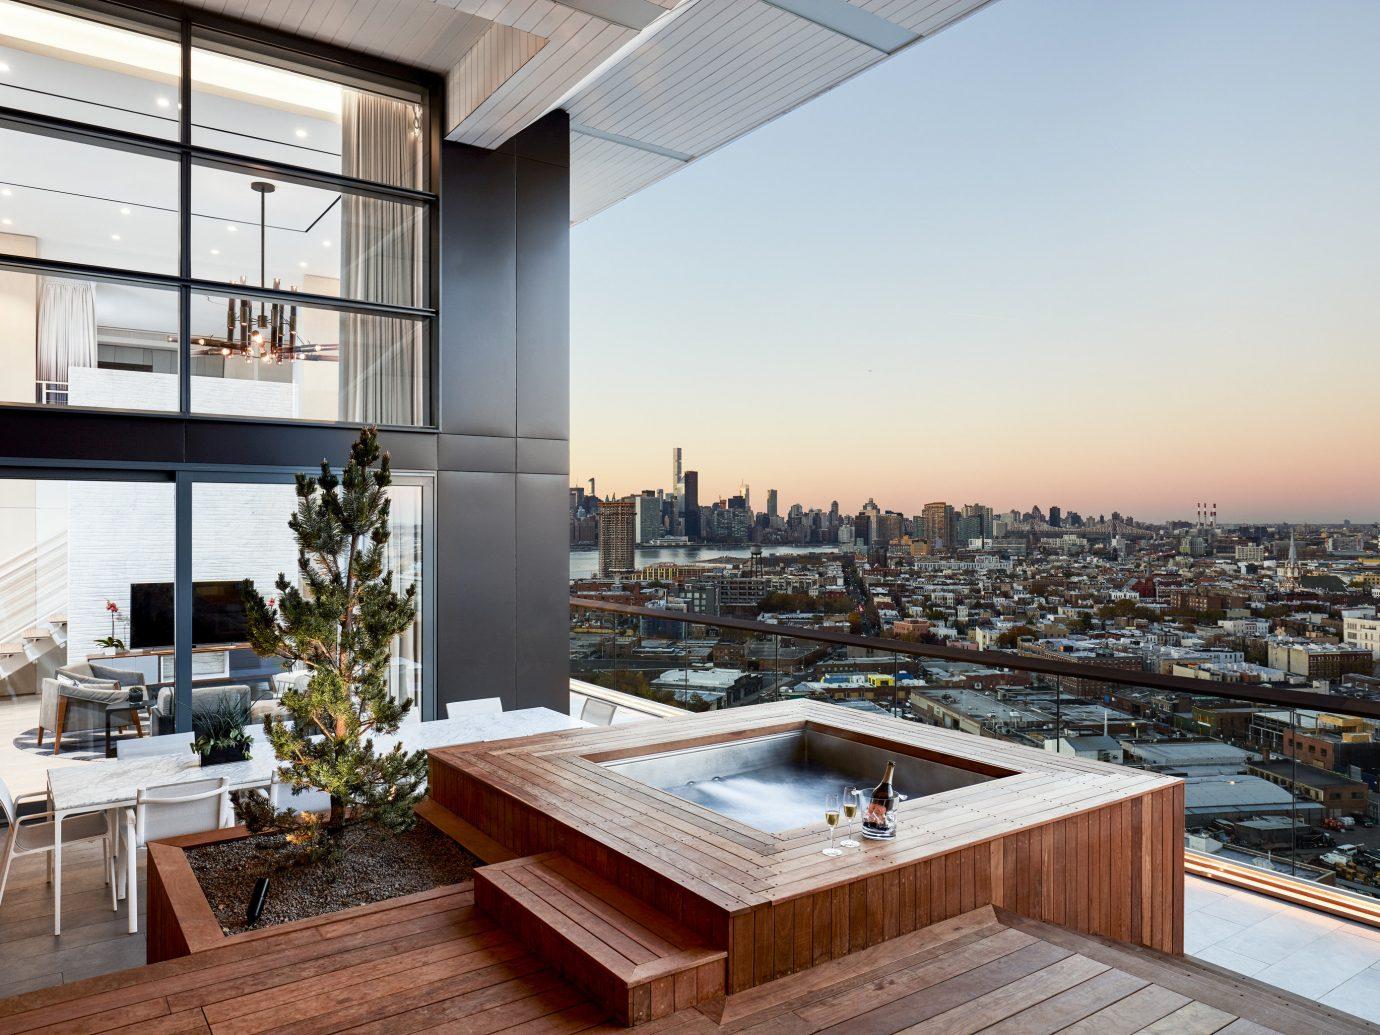 Hotels Trip Ideas property building house Architecture home estate condominium facade wood interior design professional